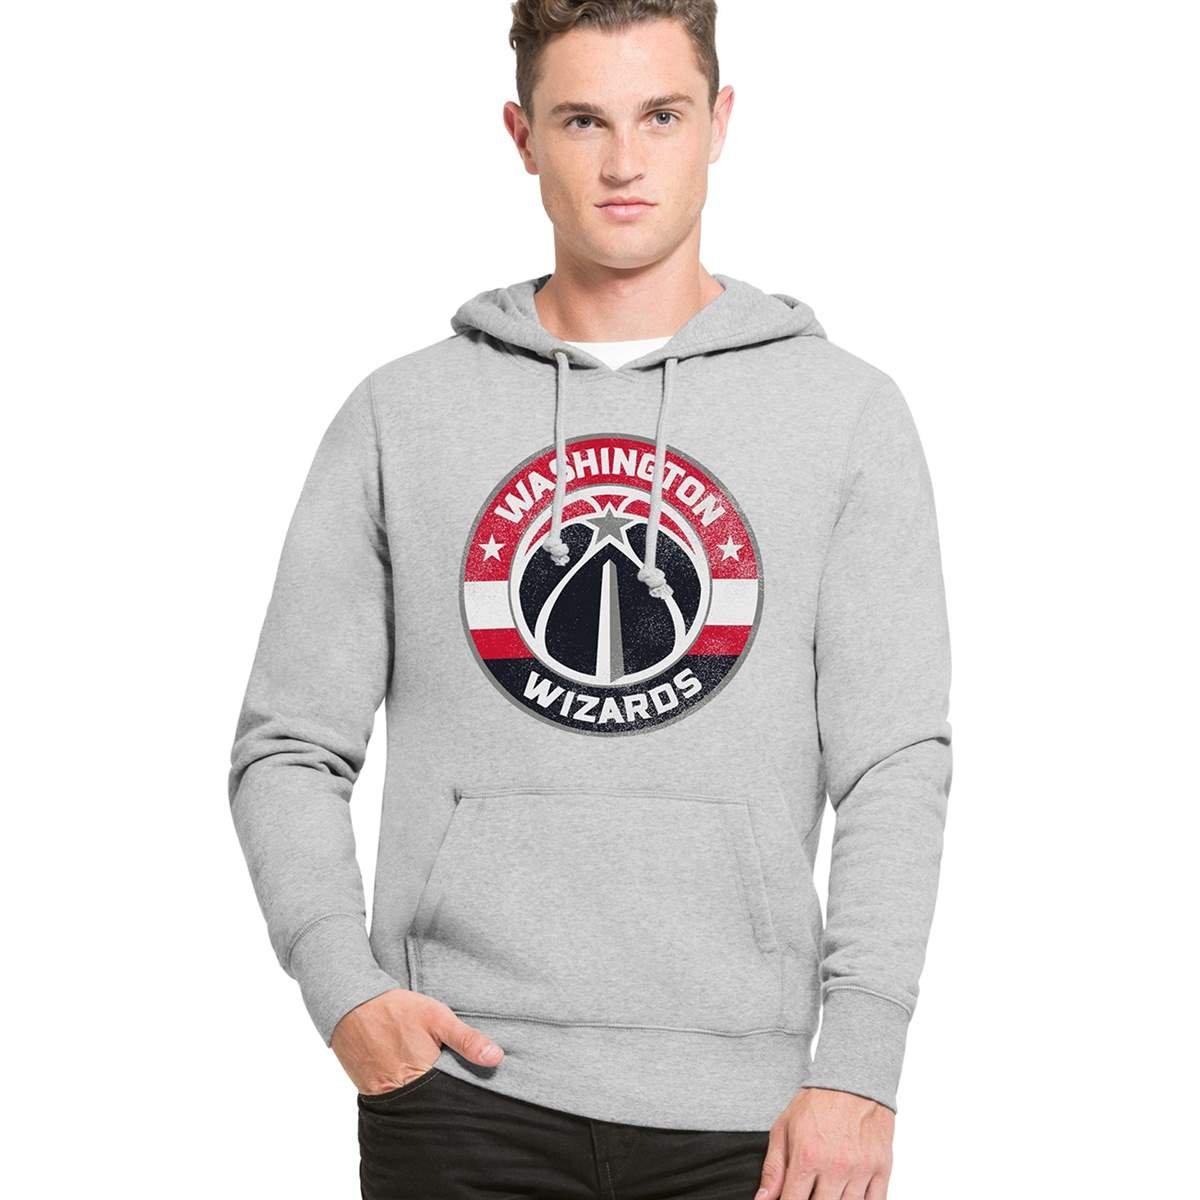 '47 Brand Washington Wizards Knockaround Hoodie NBA Sweatshirt